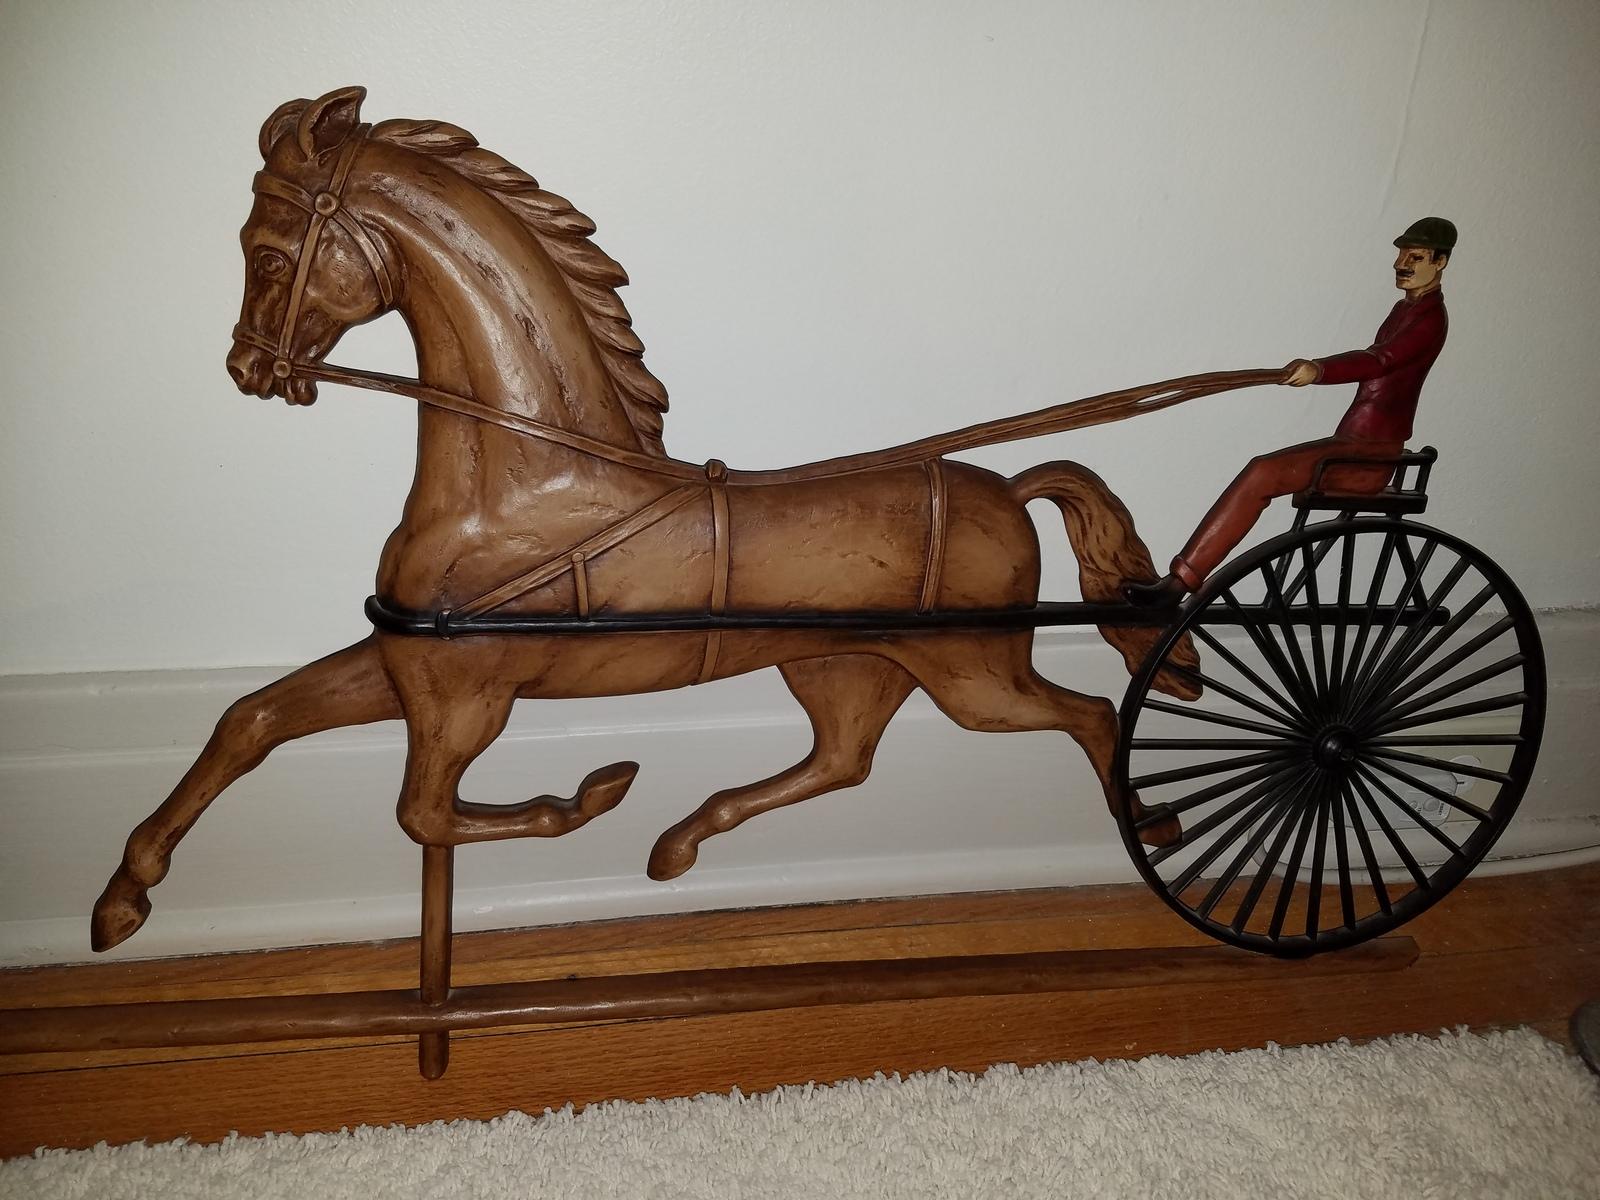 Vintage Ethan Allen wall decor horse and jockey circa 1966 3 ft long antique Art